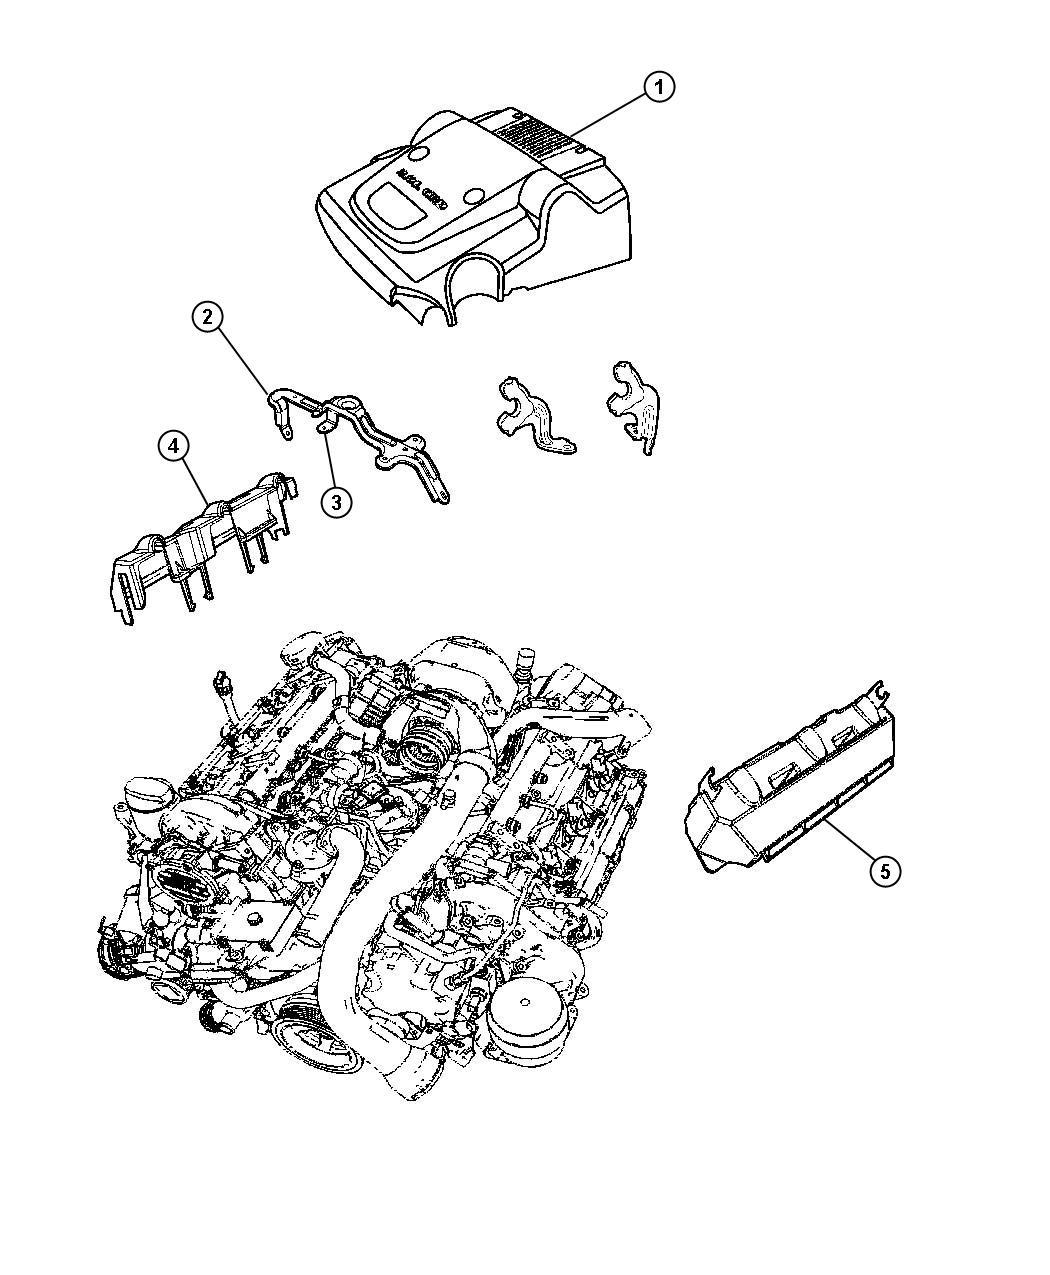 [DIAGRAM] 2000 Jeep Grand Cherokee Laredo Engine Diagram